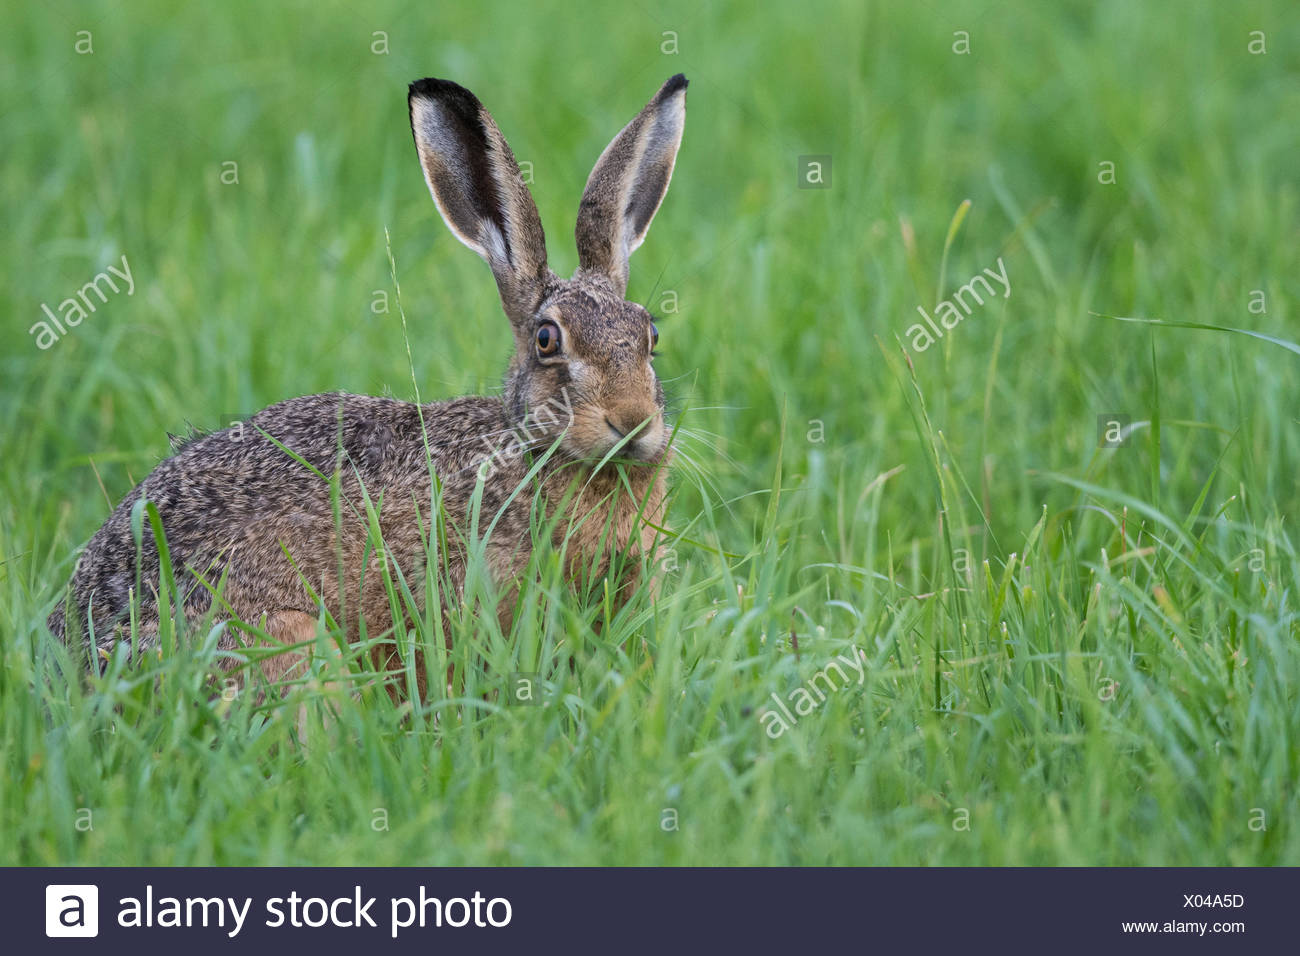 european hare, lepus europaeus - Stock Image